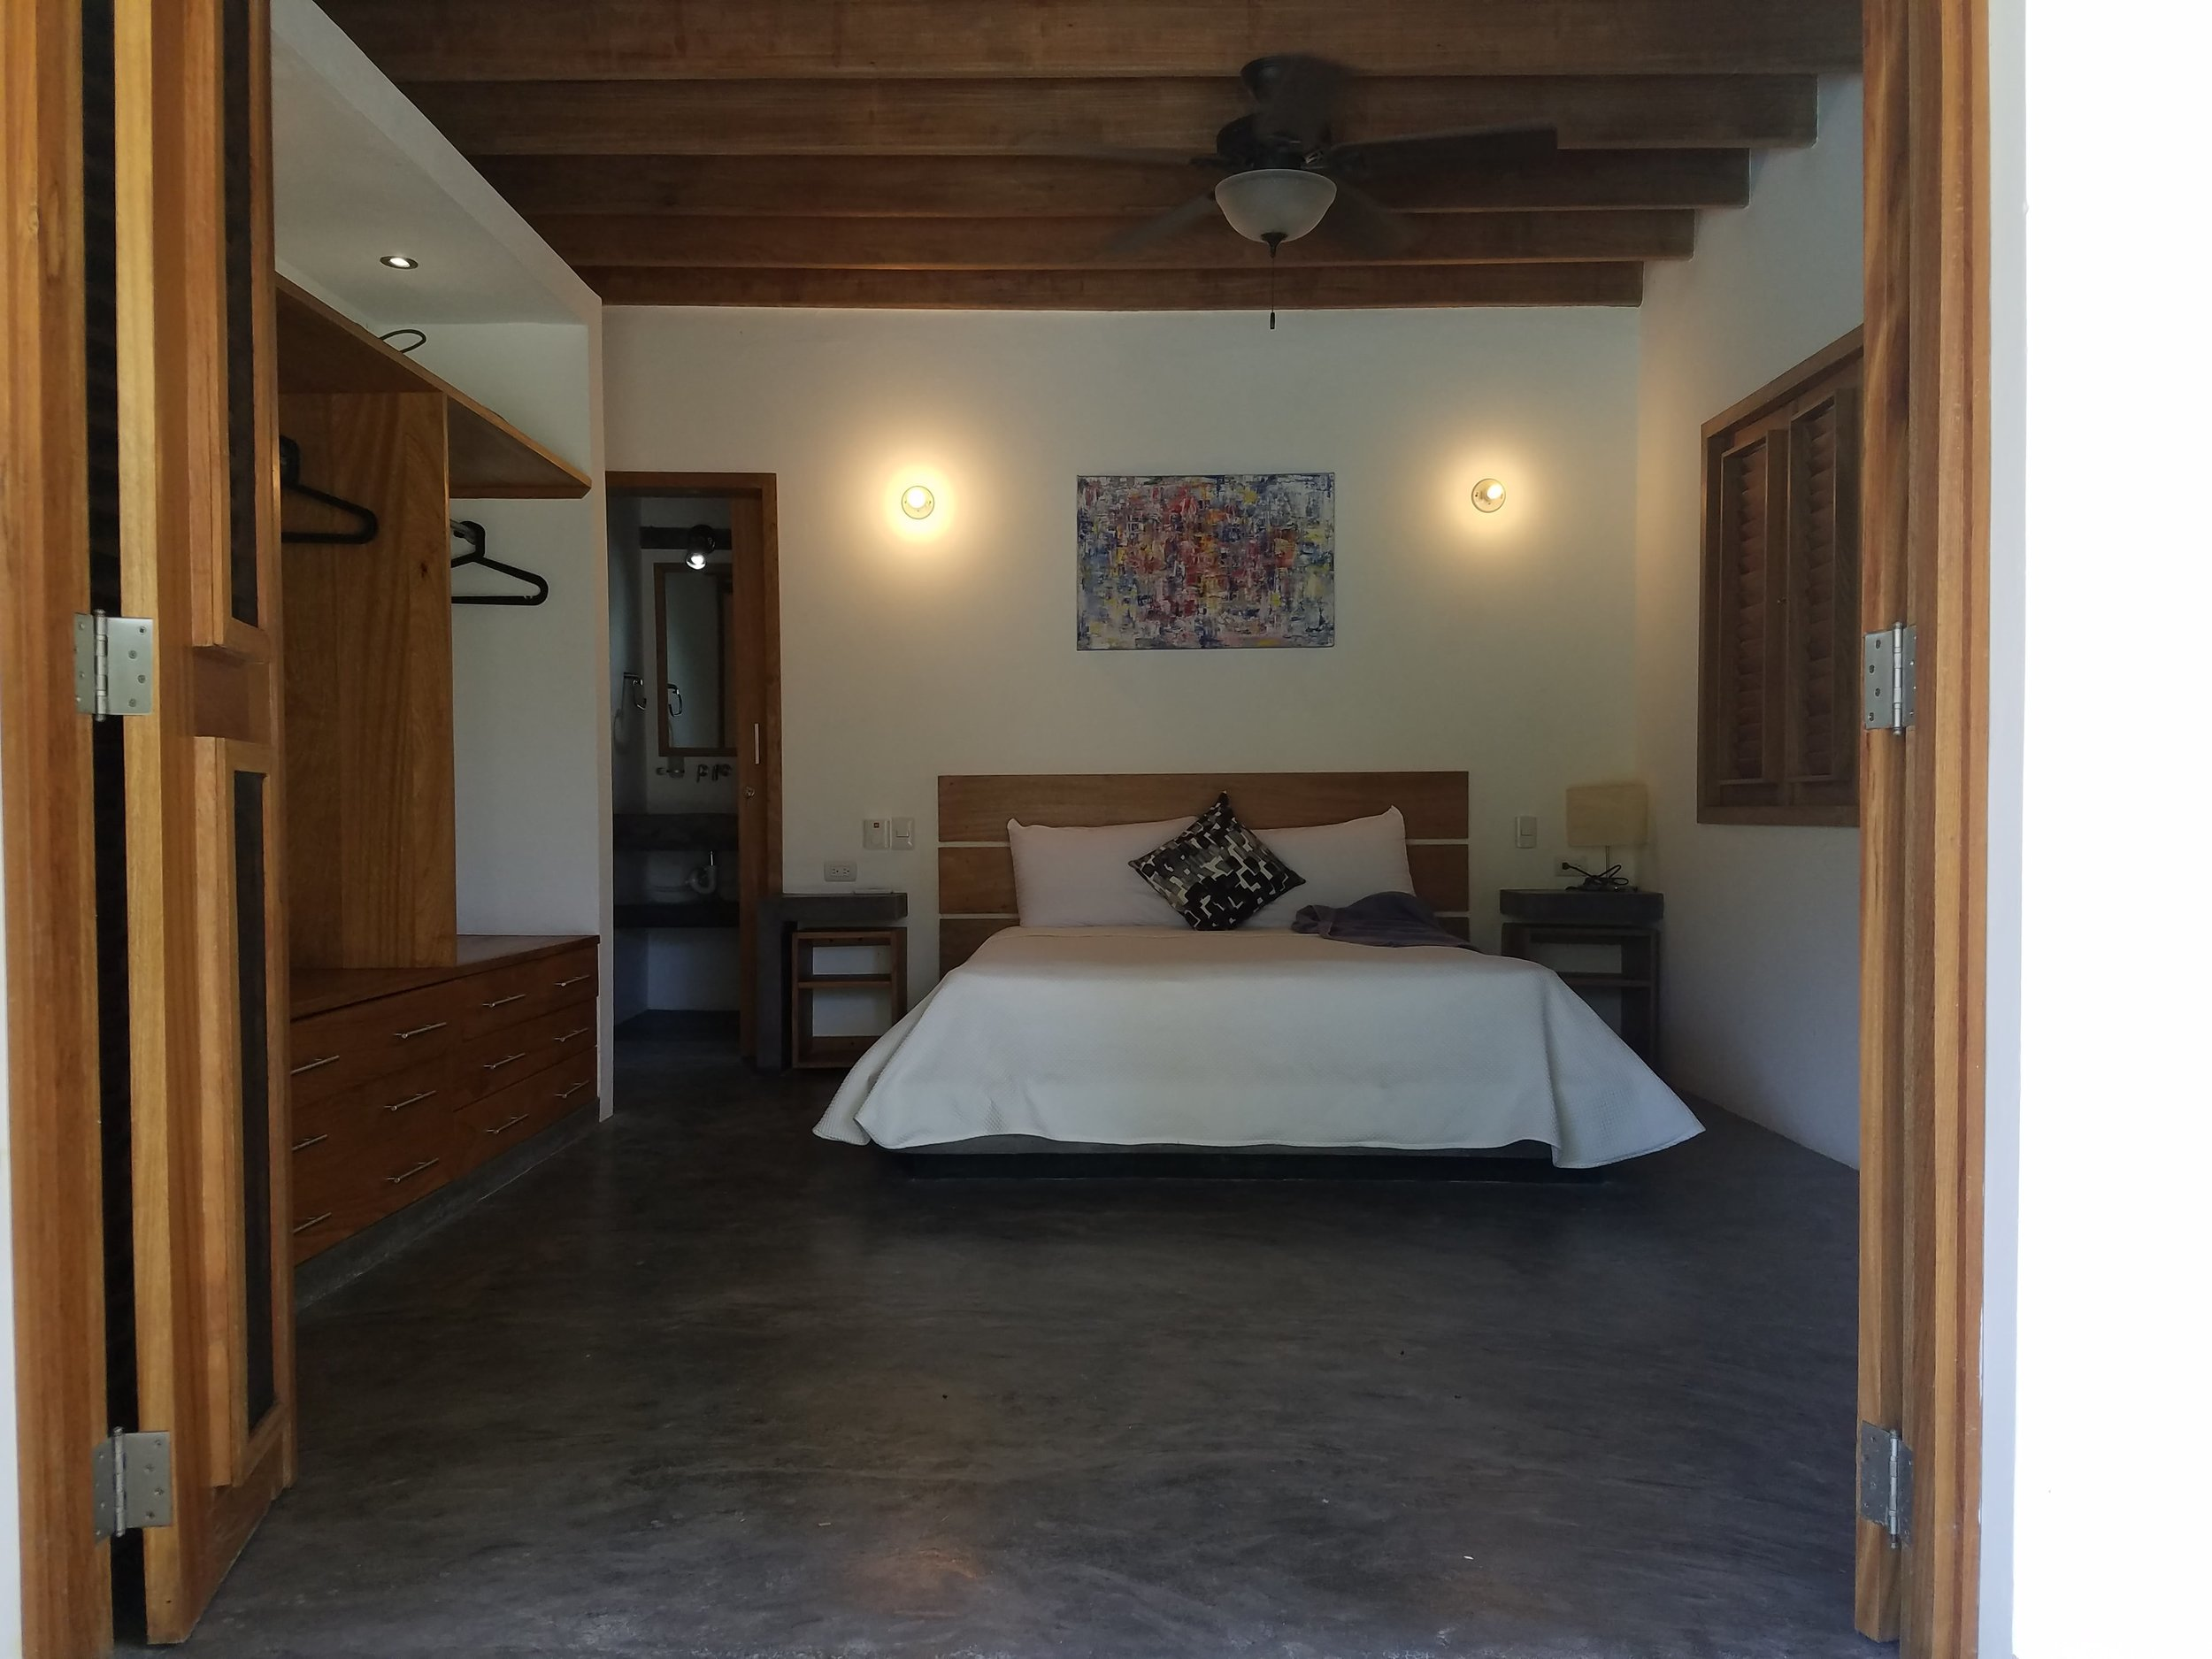 Villa for rent Las Terrenas Cote ci cote la17-min.jpg